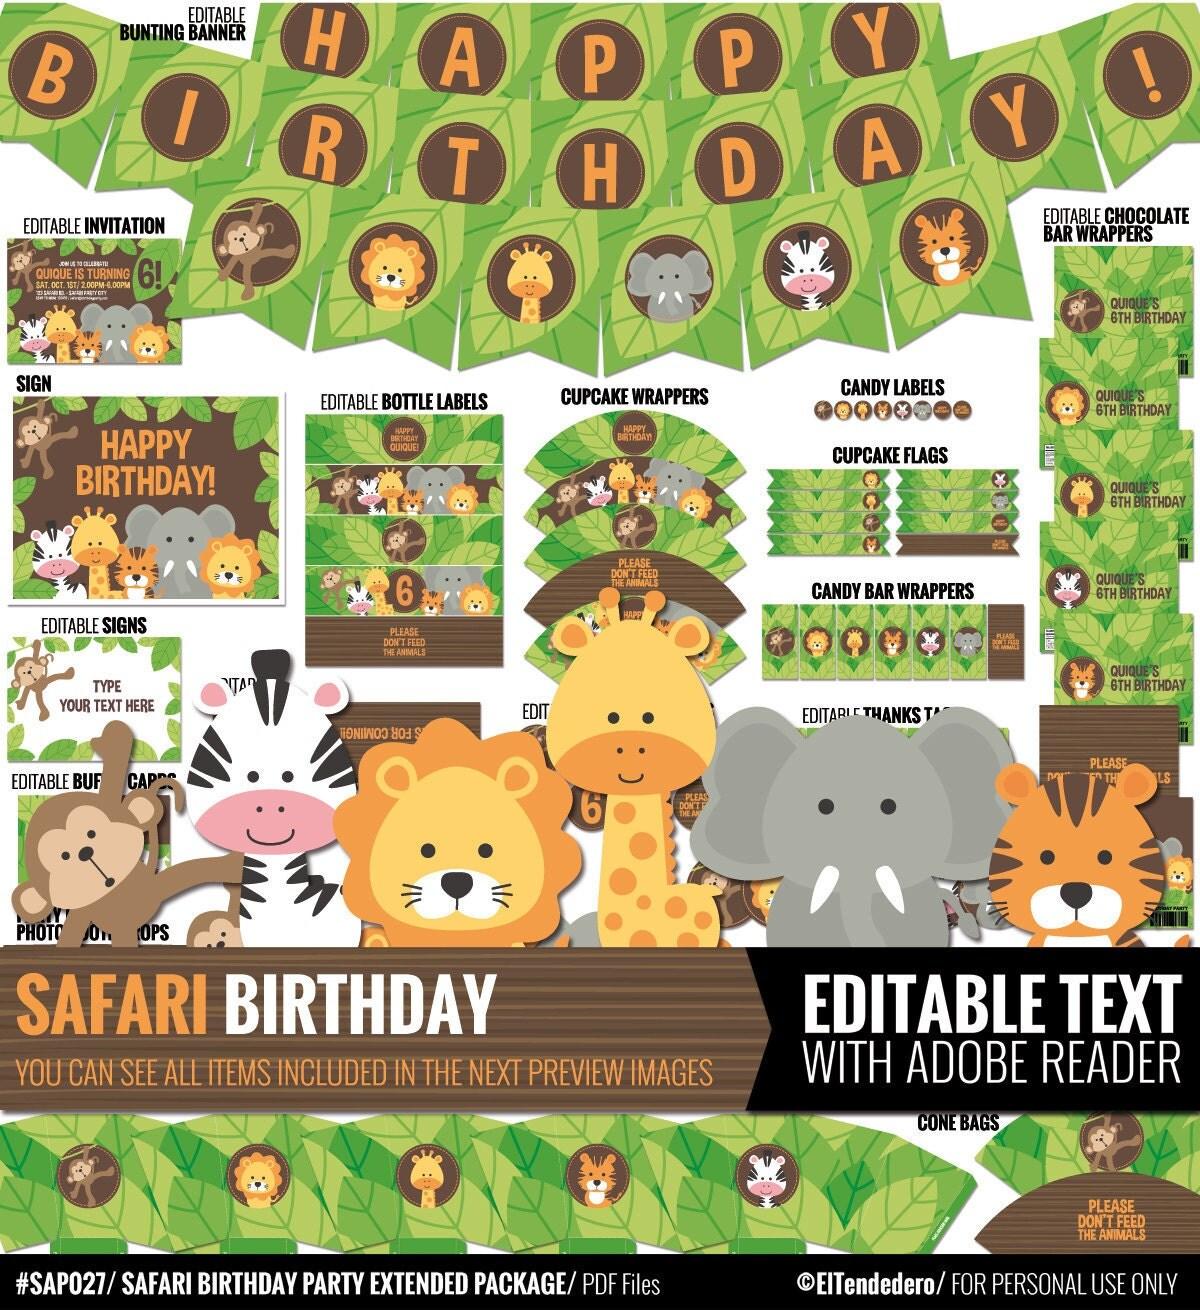 Google themes on safari - Safari Birthday Decorations Package Printable Jungle Theme Kids Birthday Party Decor Funny Gender Neutral First Birthday Editable